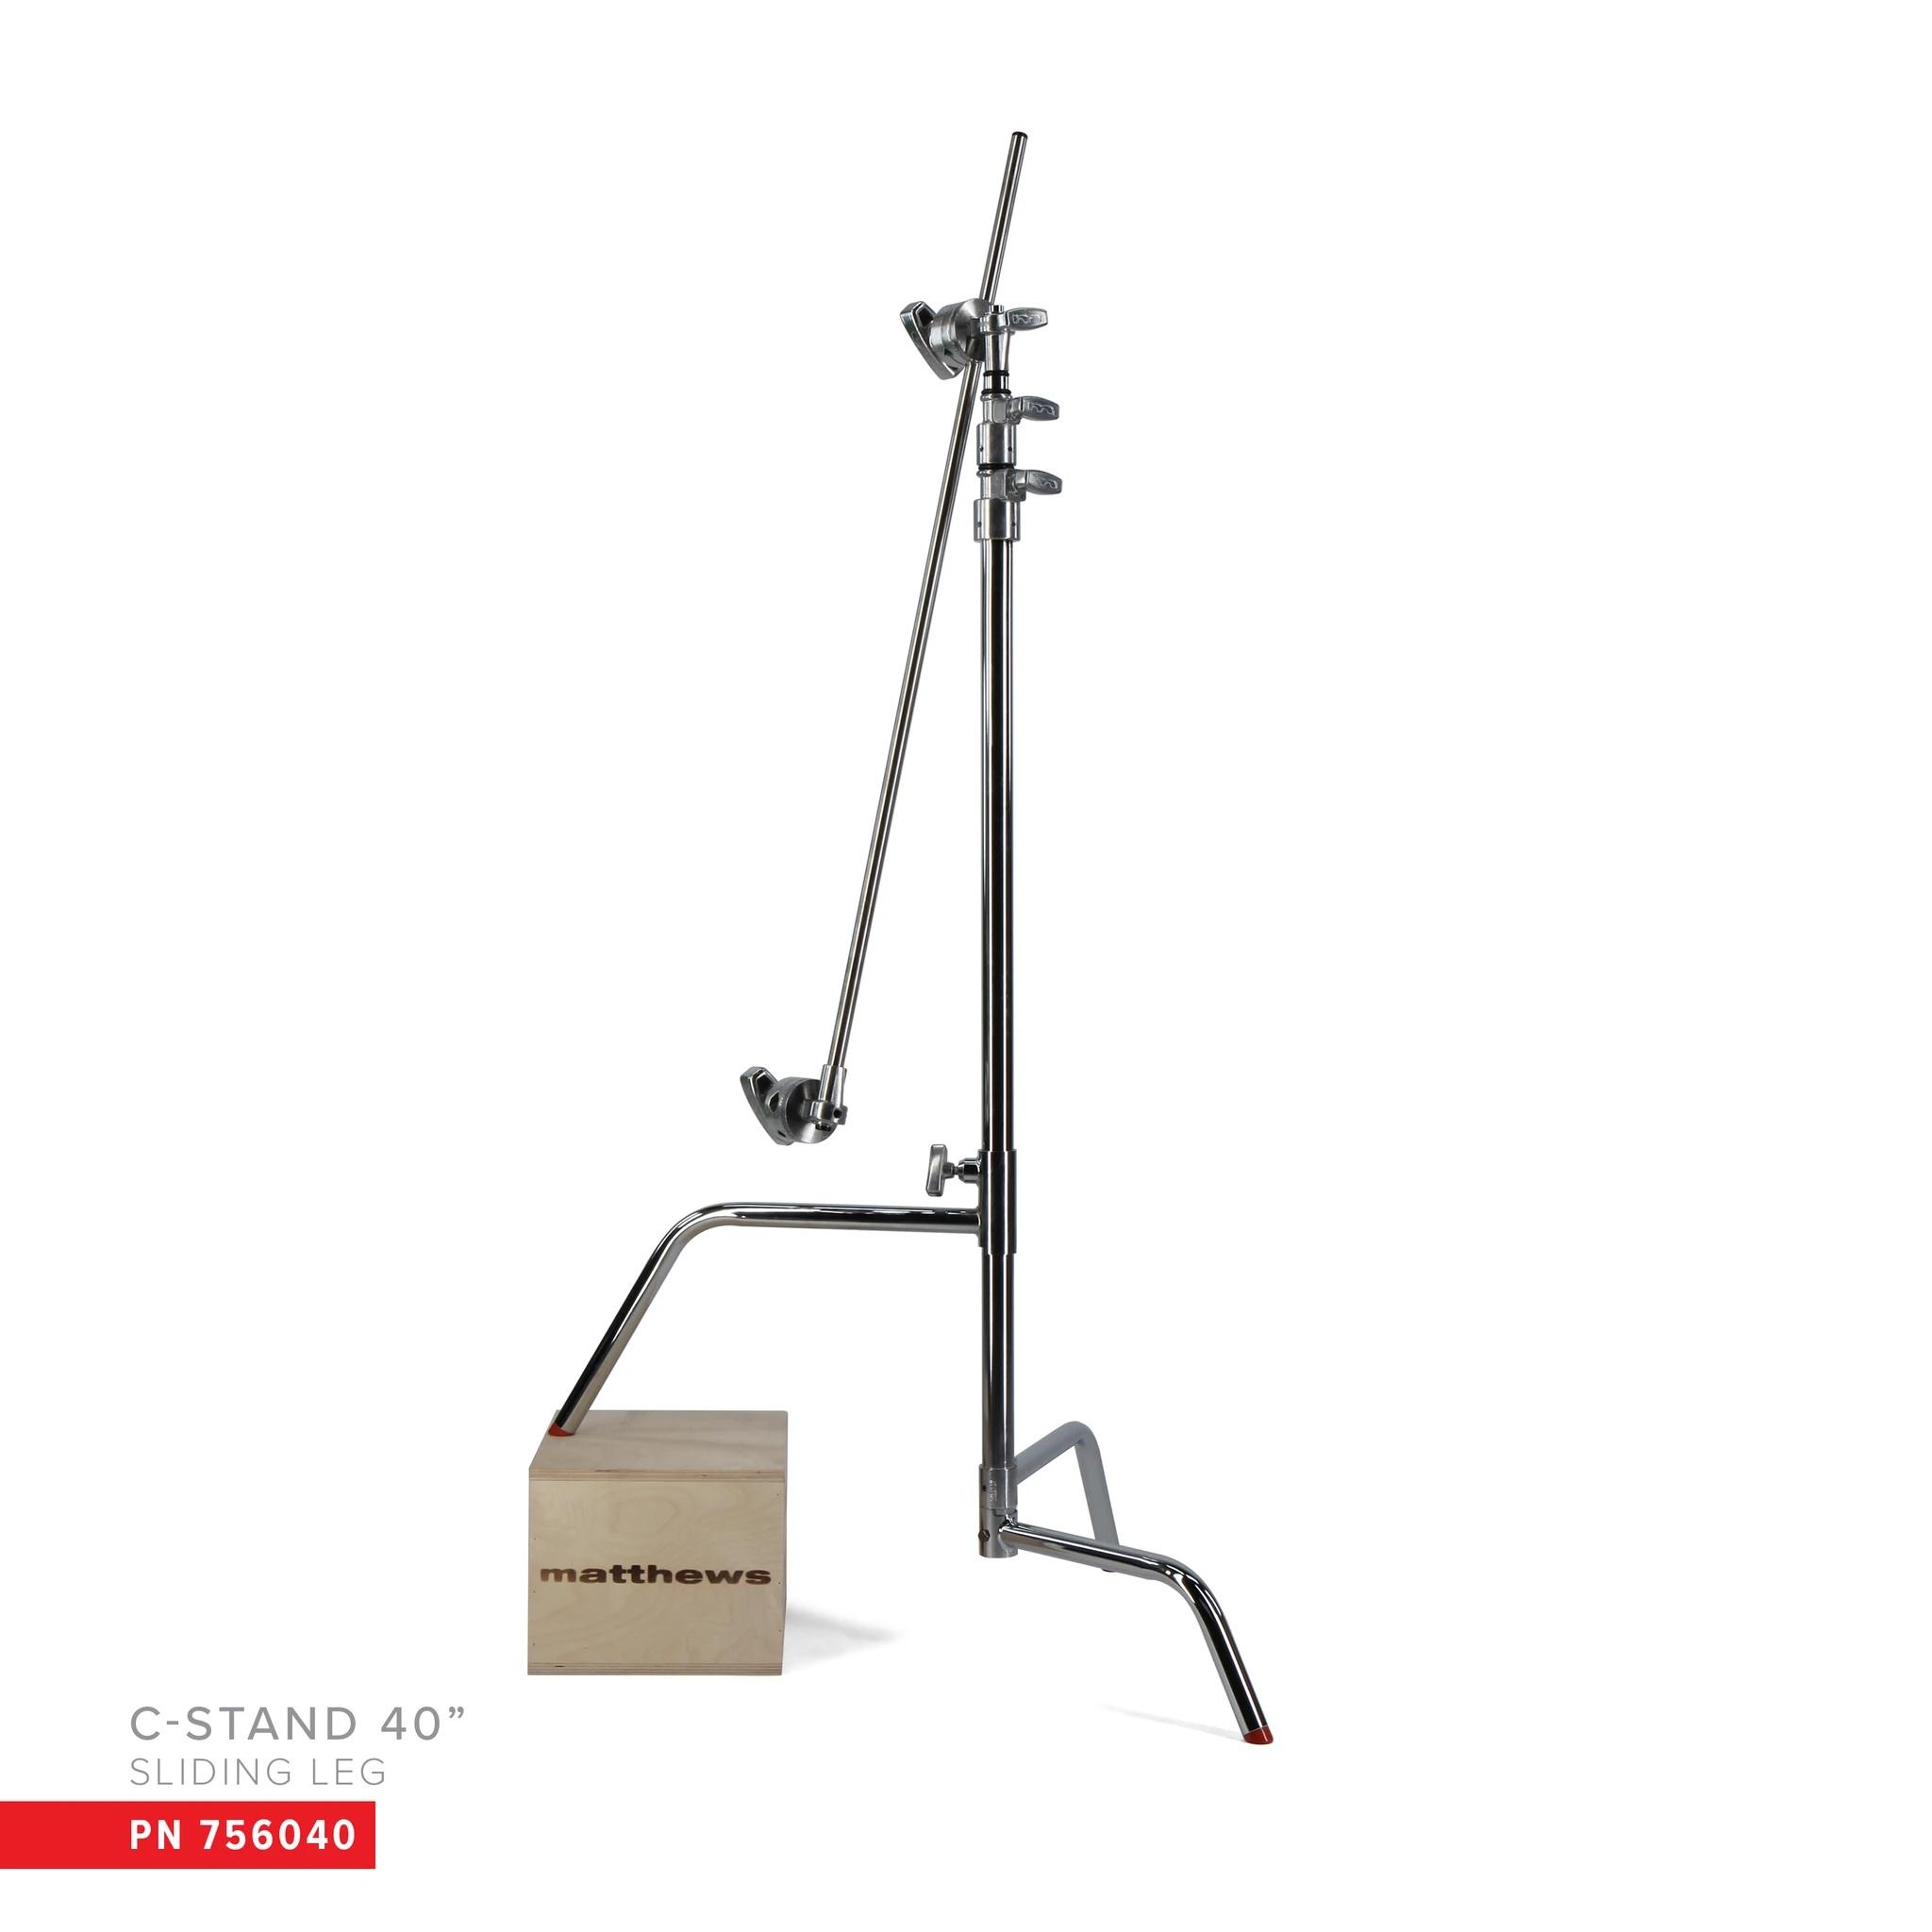 40″ C-STAND W/SLIDING LEG, INCLUDES GRIP HEAD & ARM